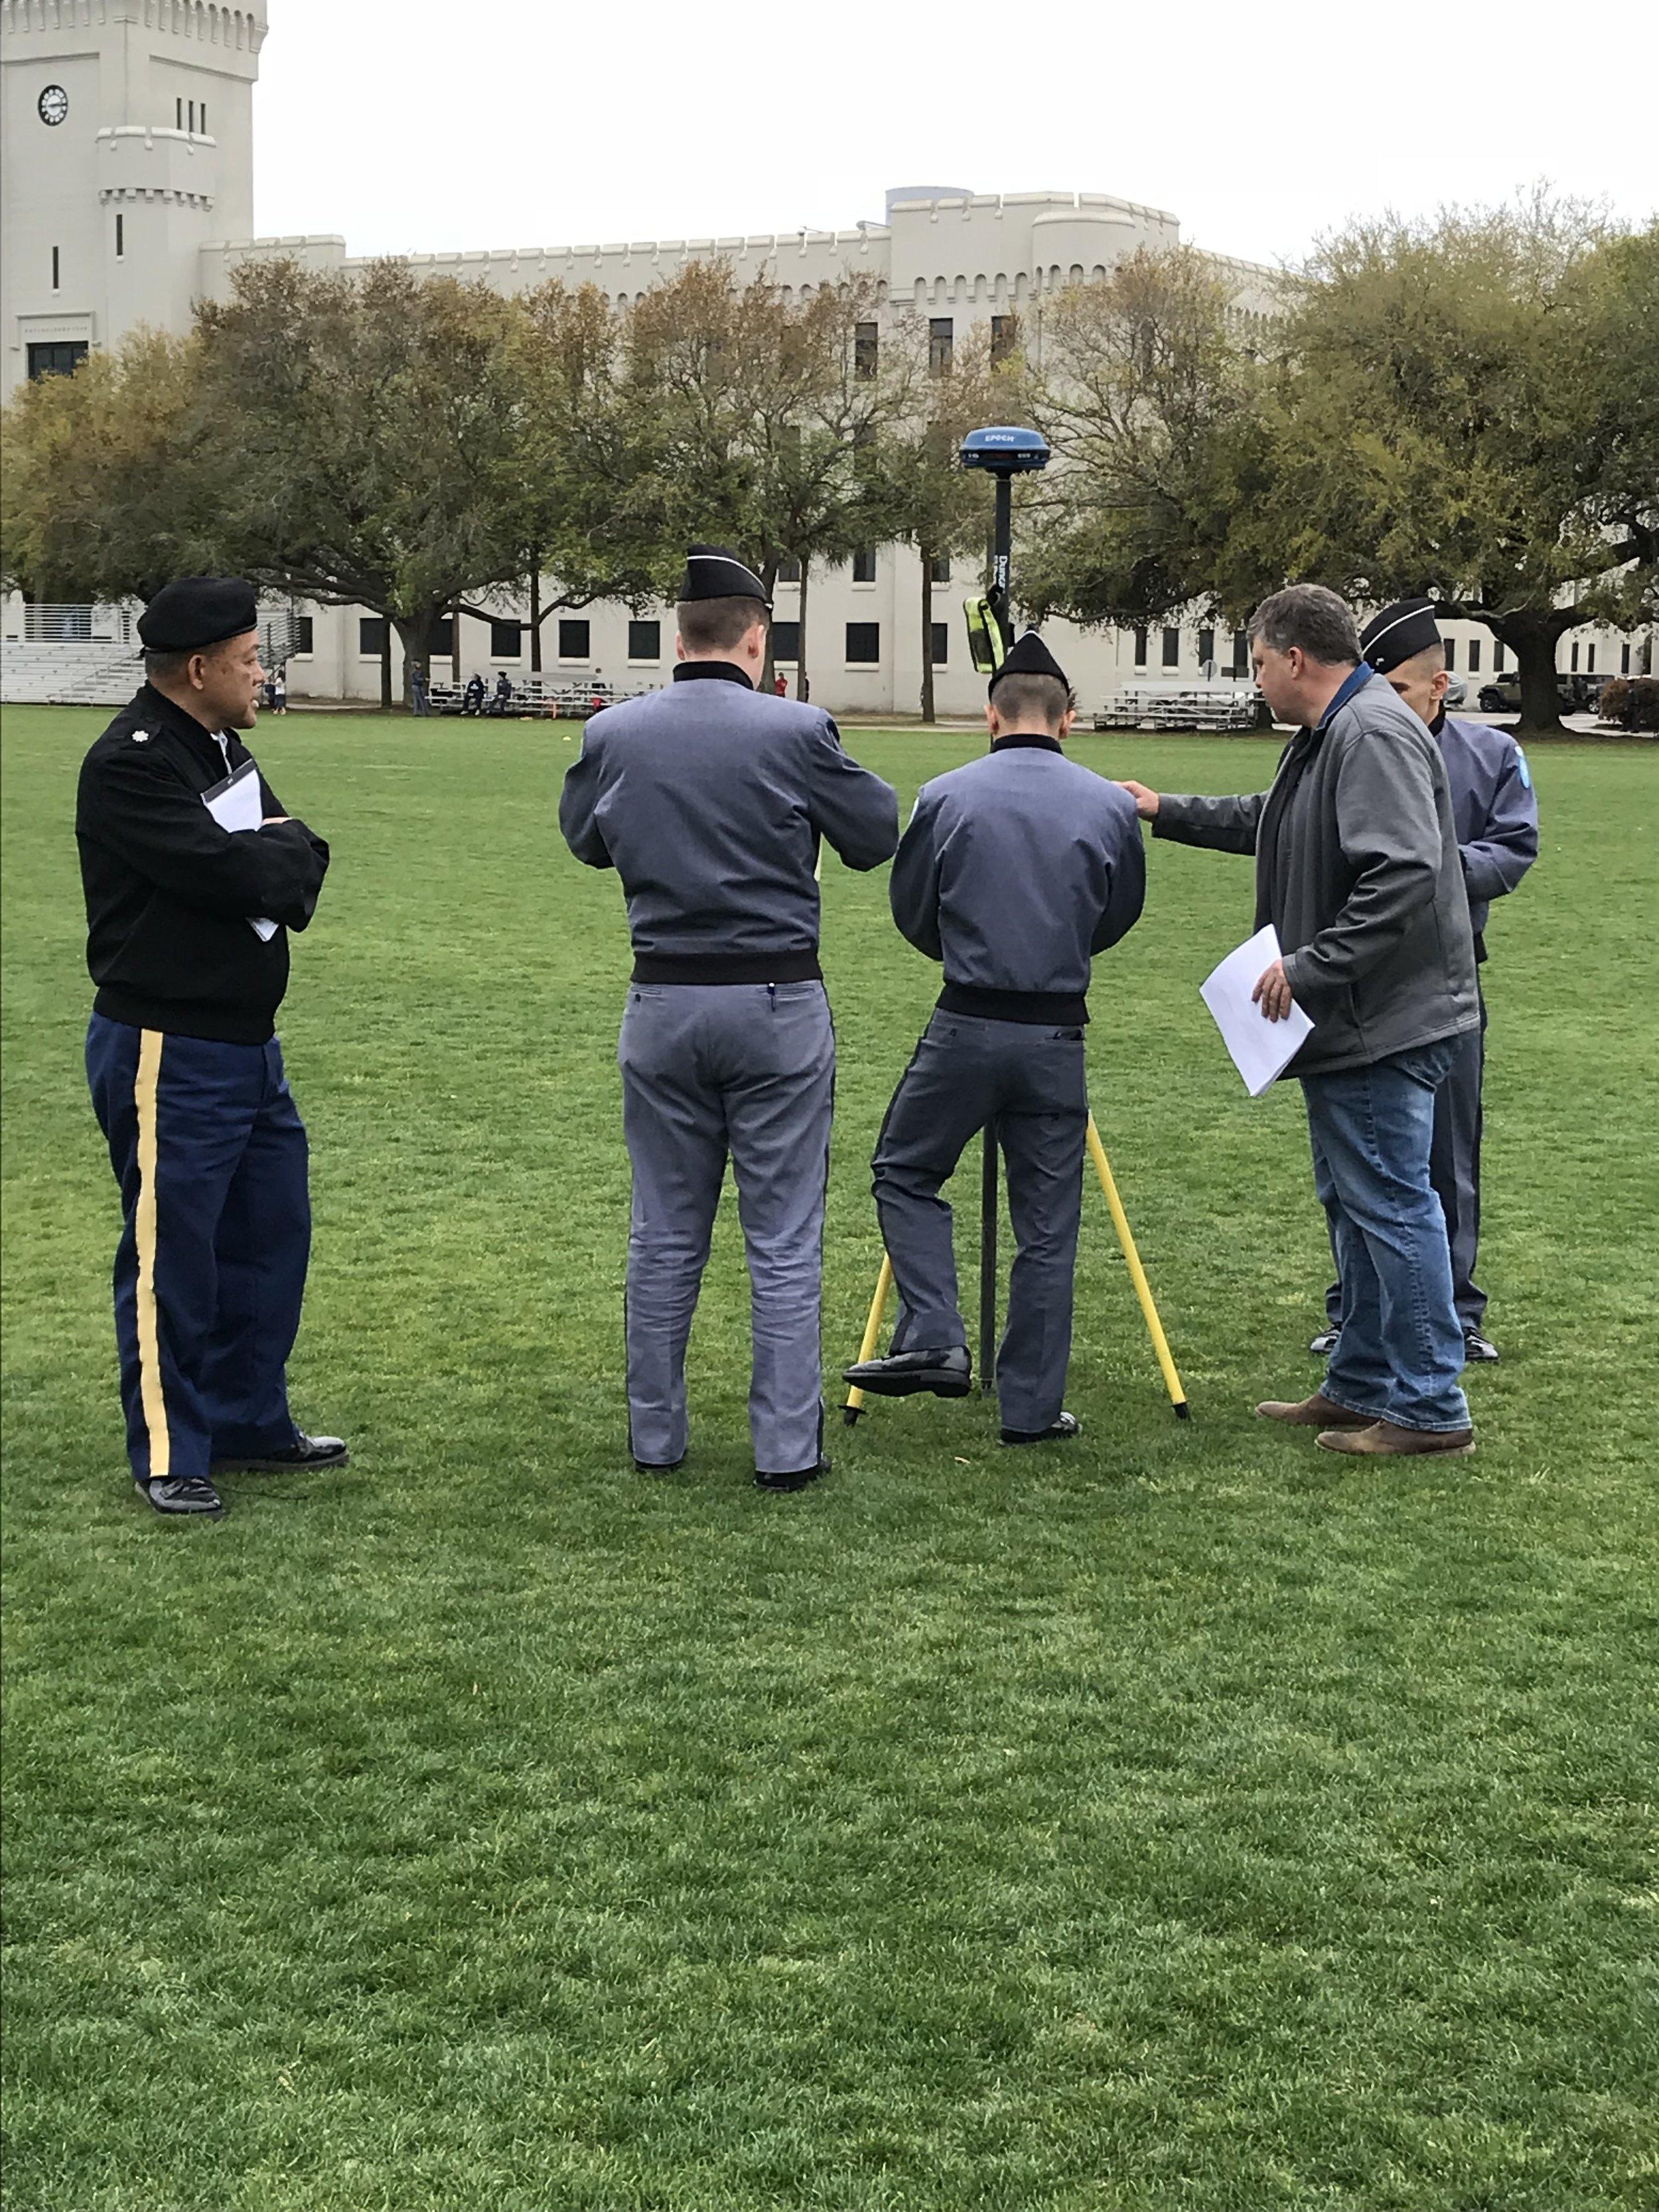 March 27th, 2018 Surveying Lab demo